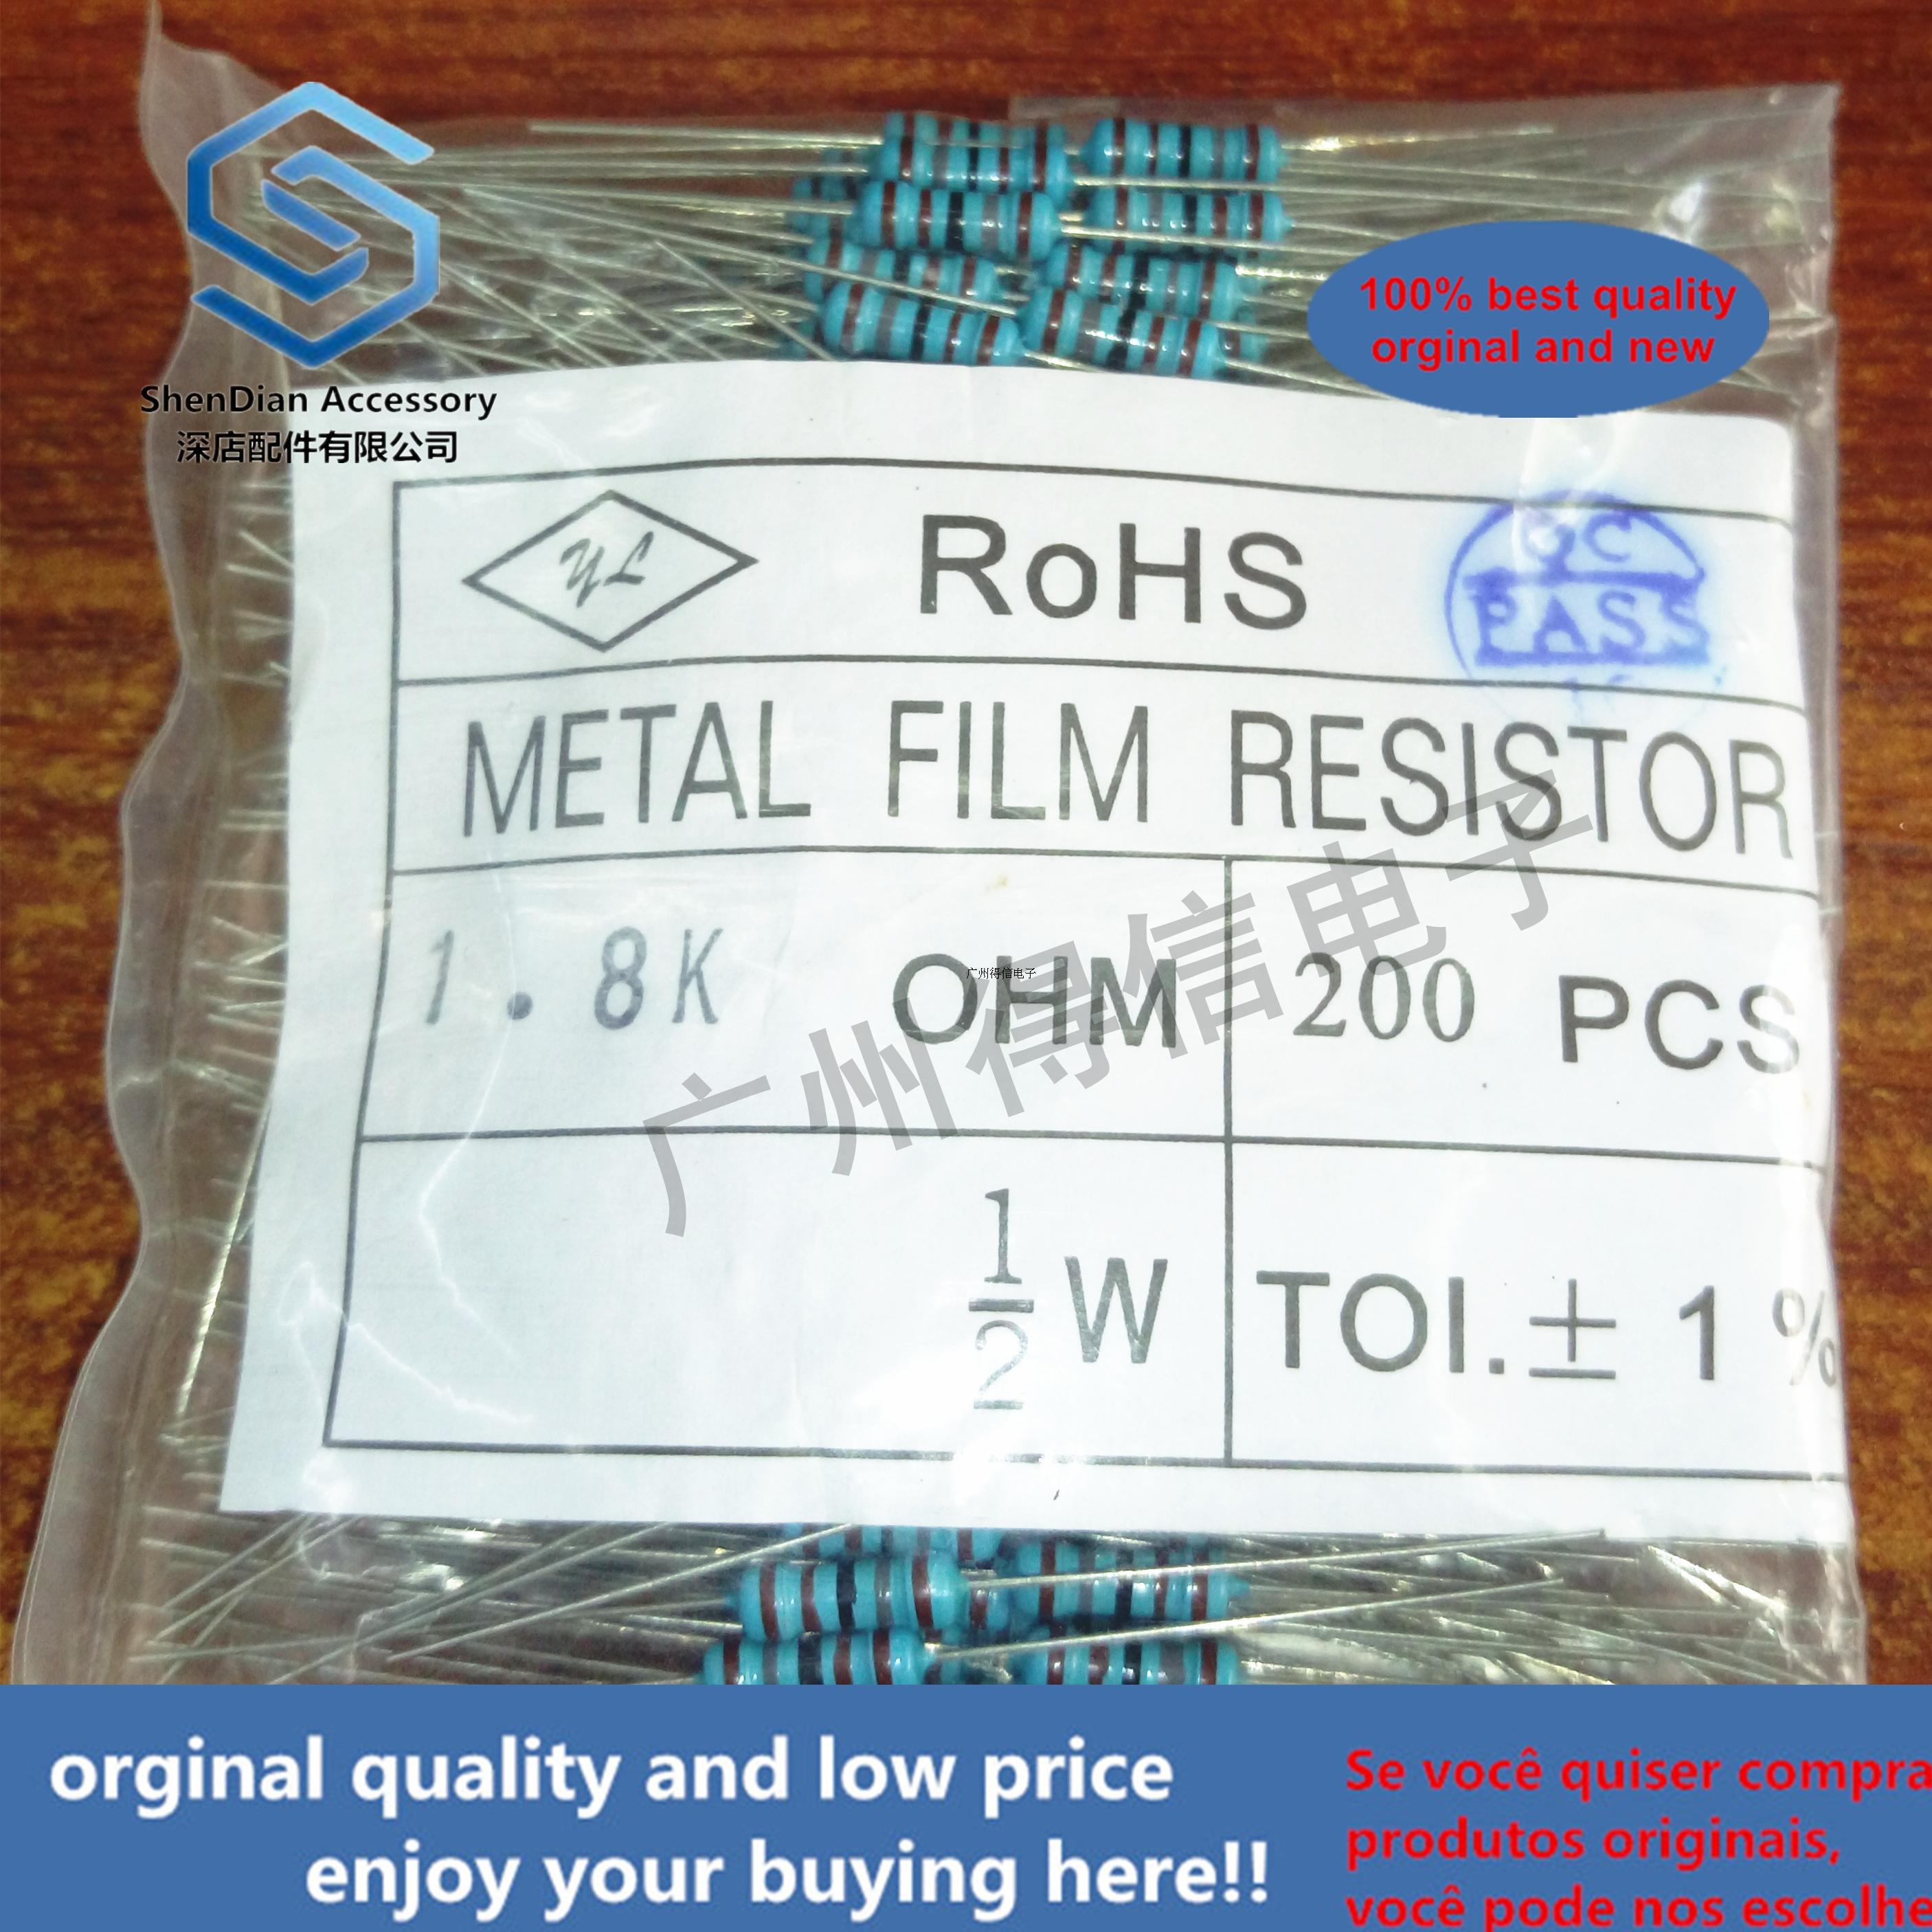 200pcs 1 / 2W 2K2 2200 Euro 1% Brand New Metal Film Iron Feet Resistor Bag 200 Pcs Per Pack